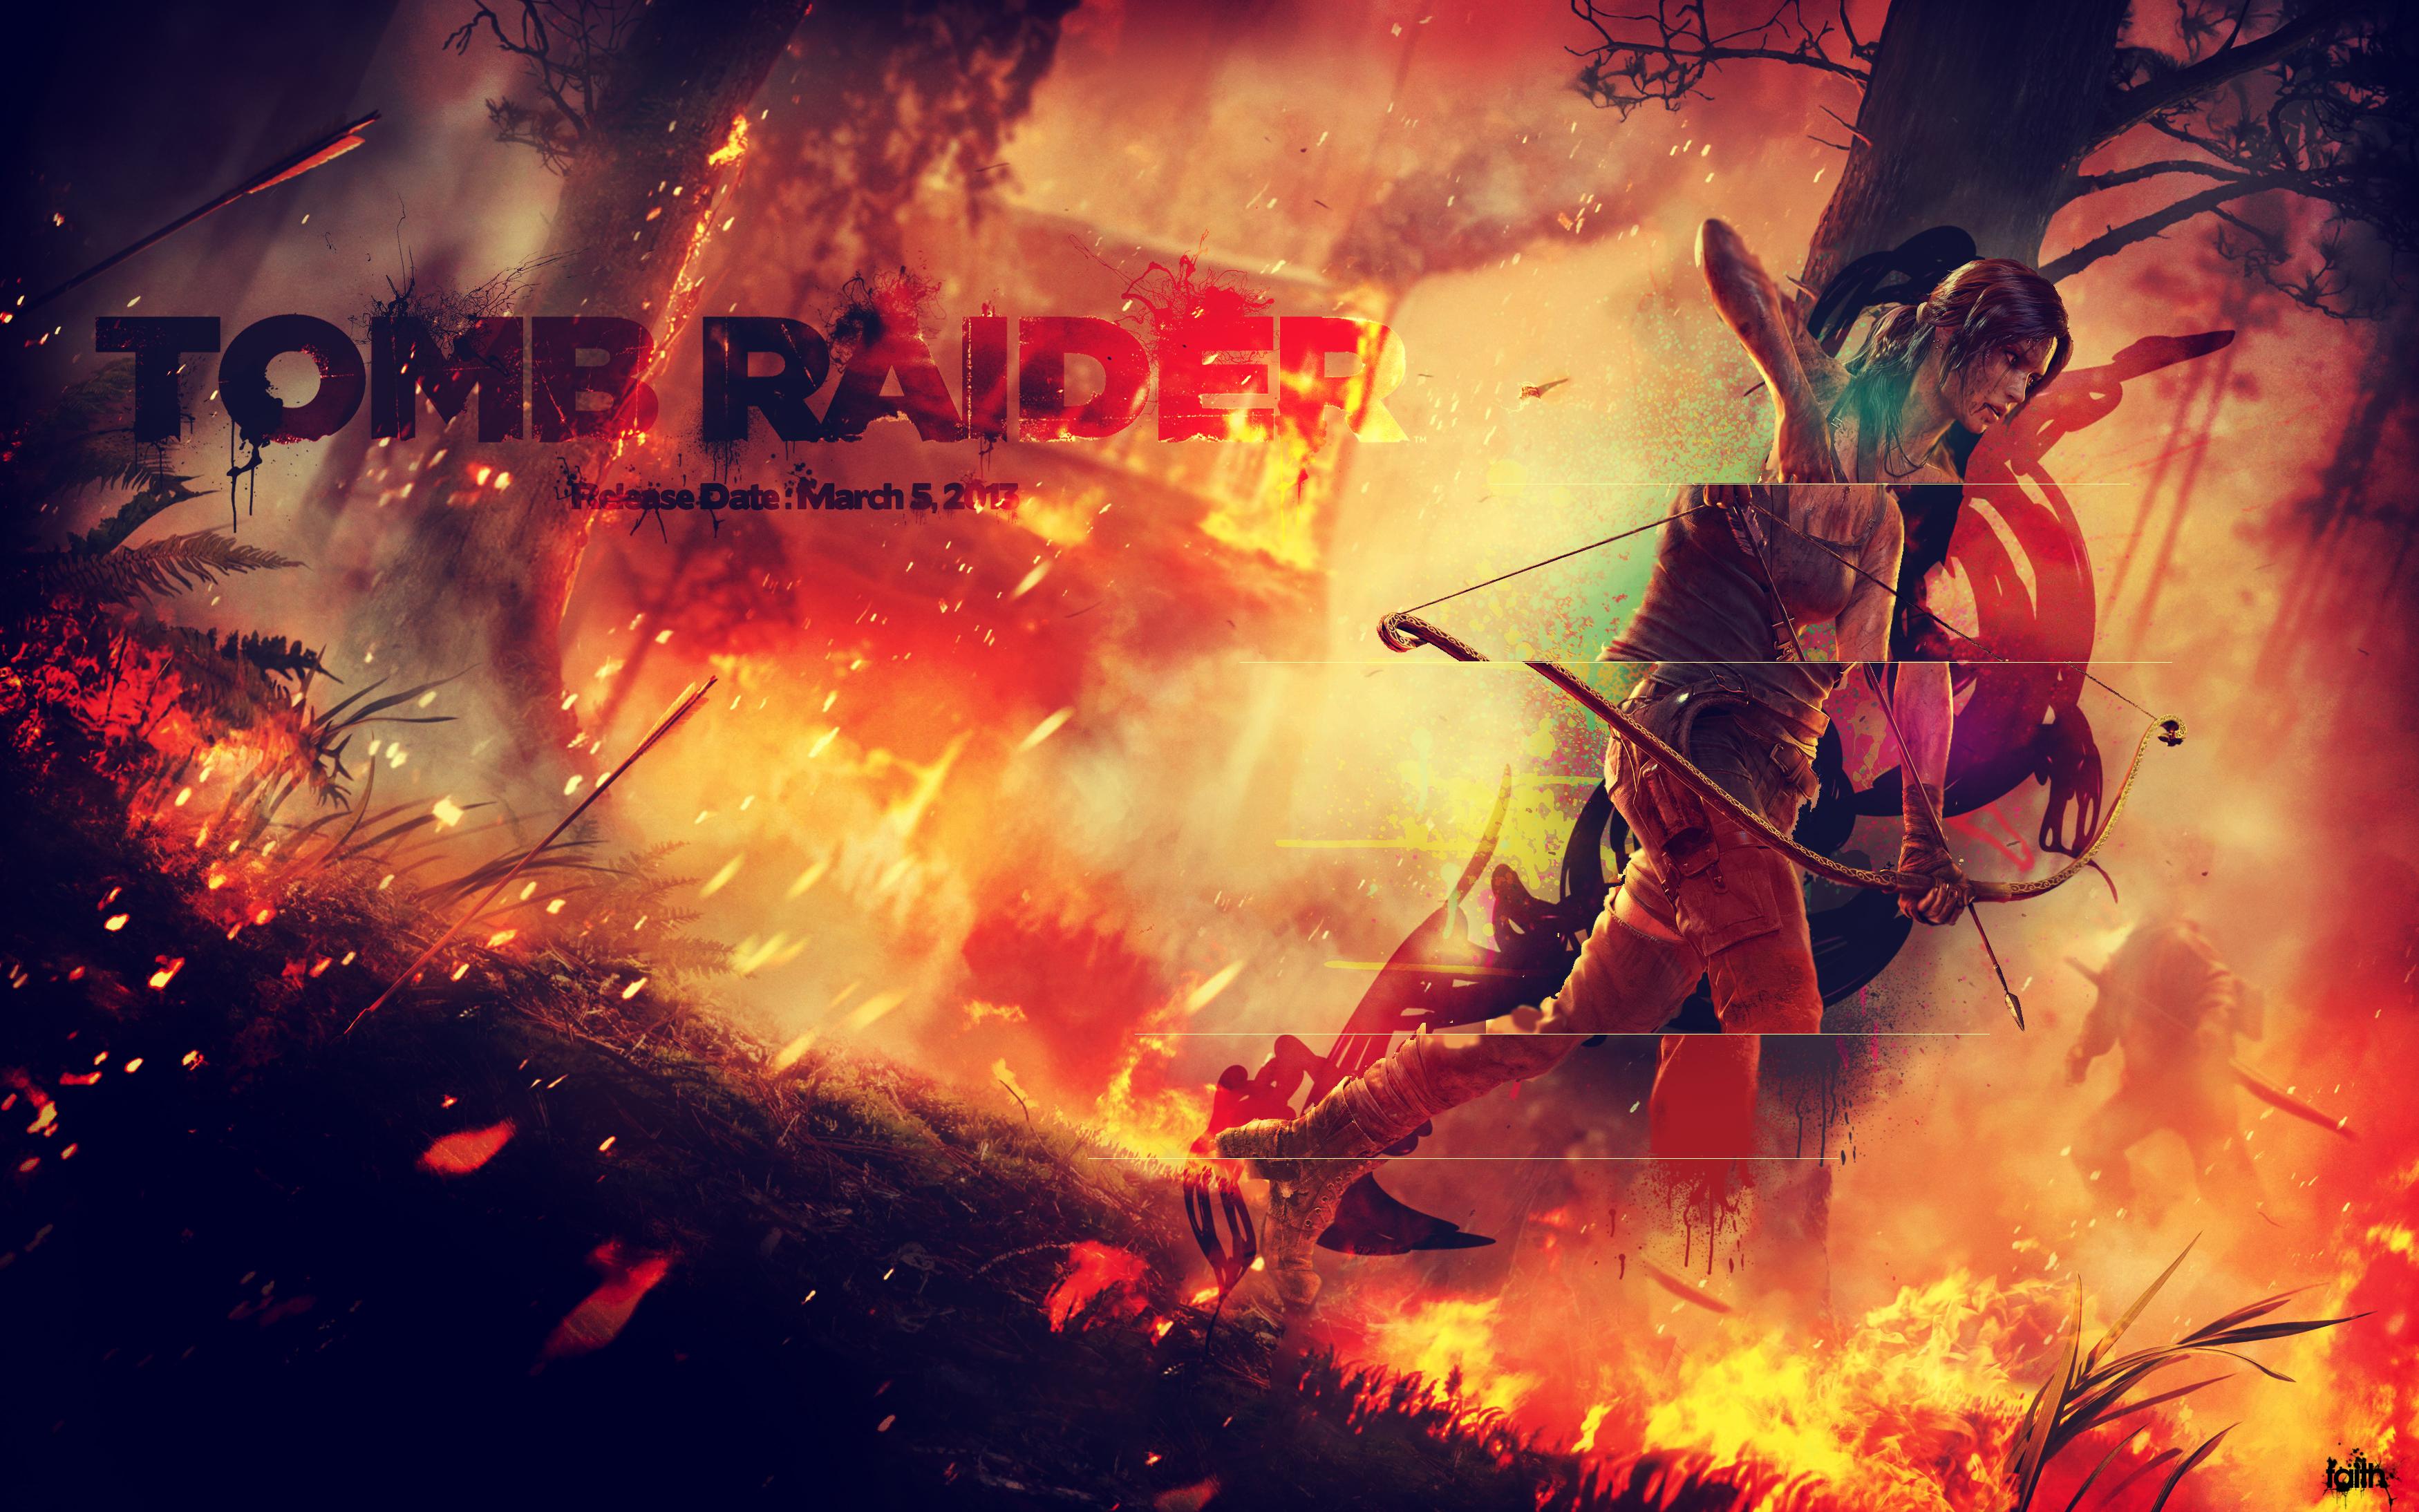 Tomb Raider 2013 Mainpulation by Faith-LV